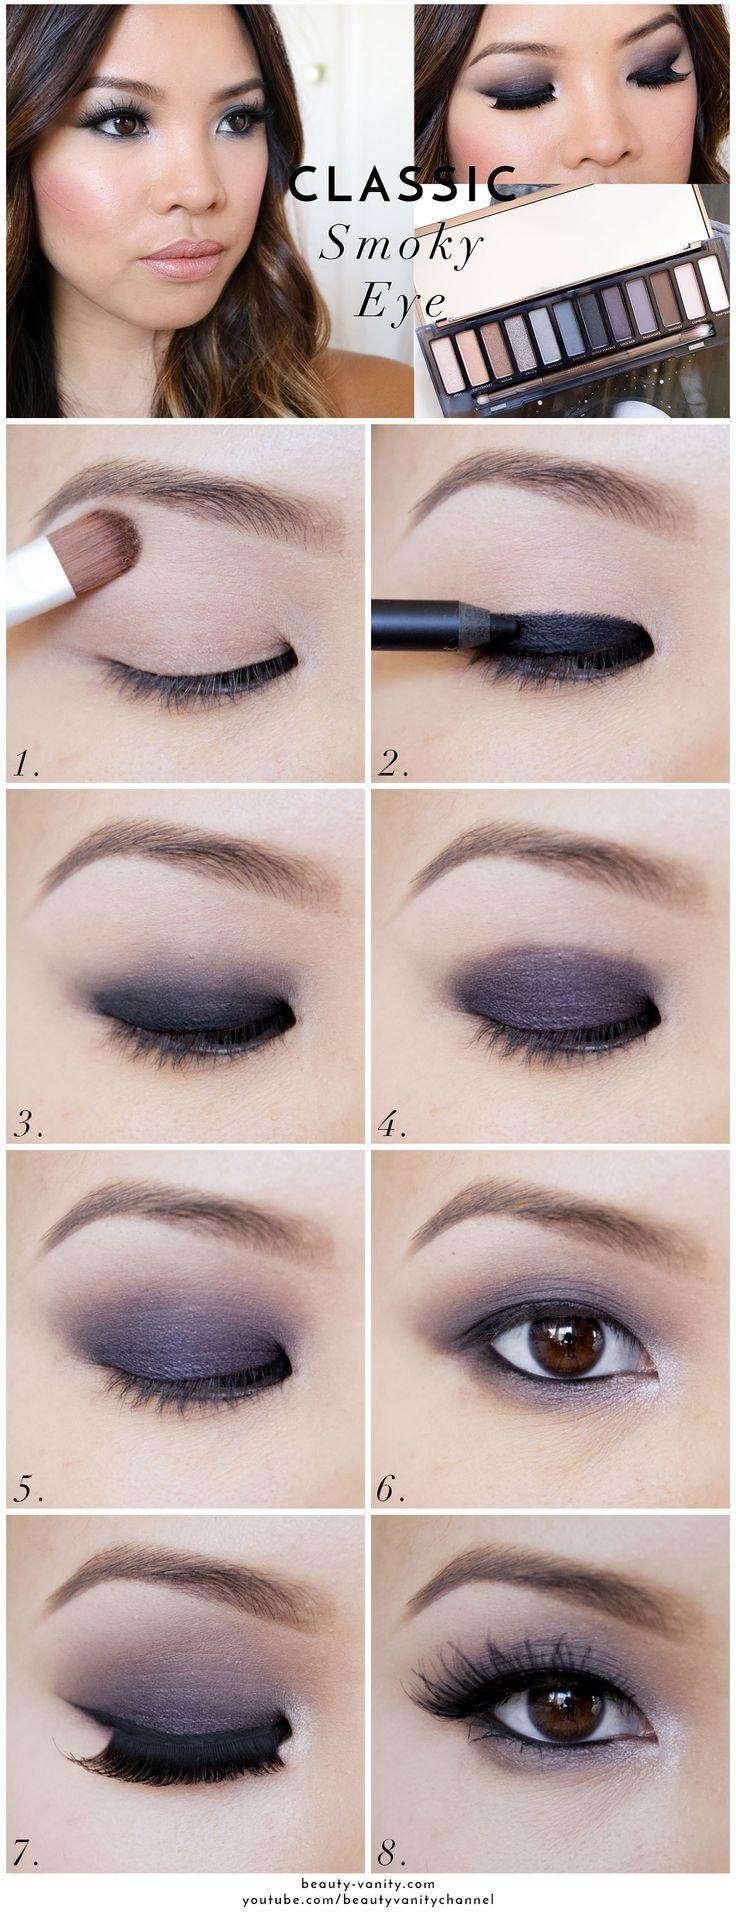 Source: Beautyvanity